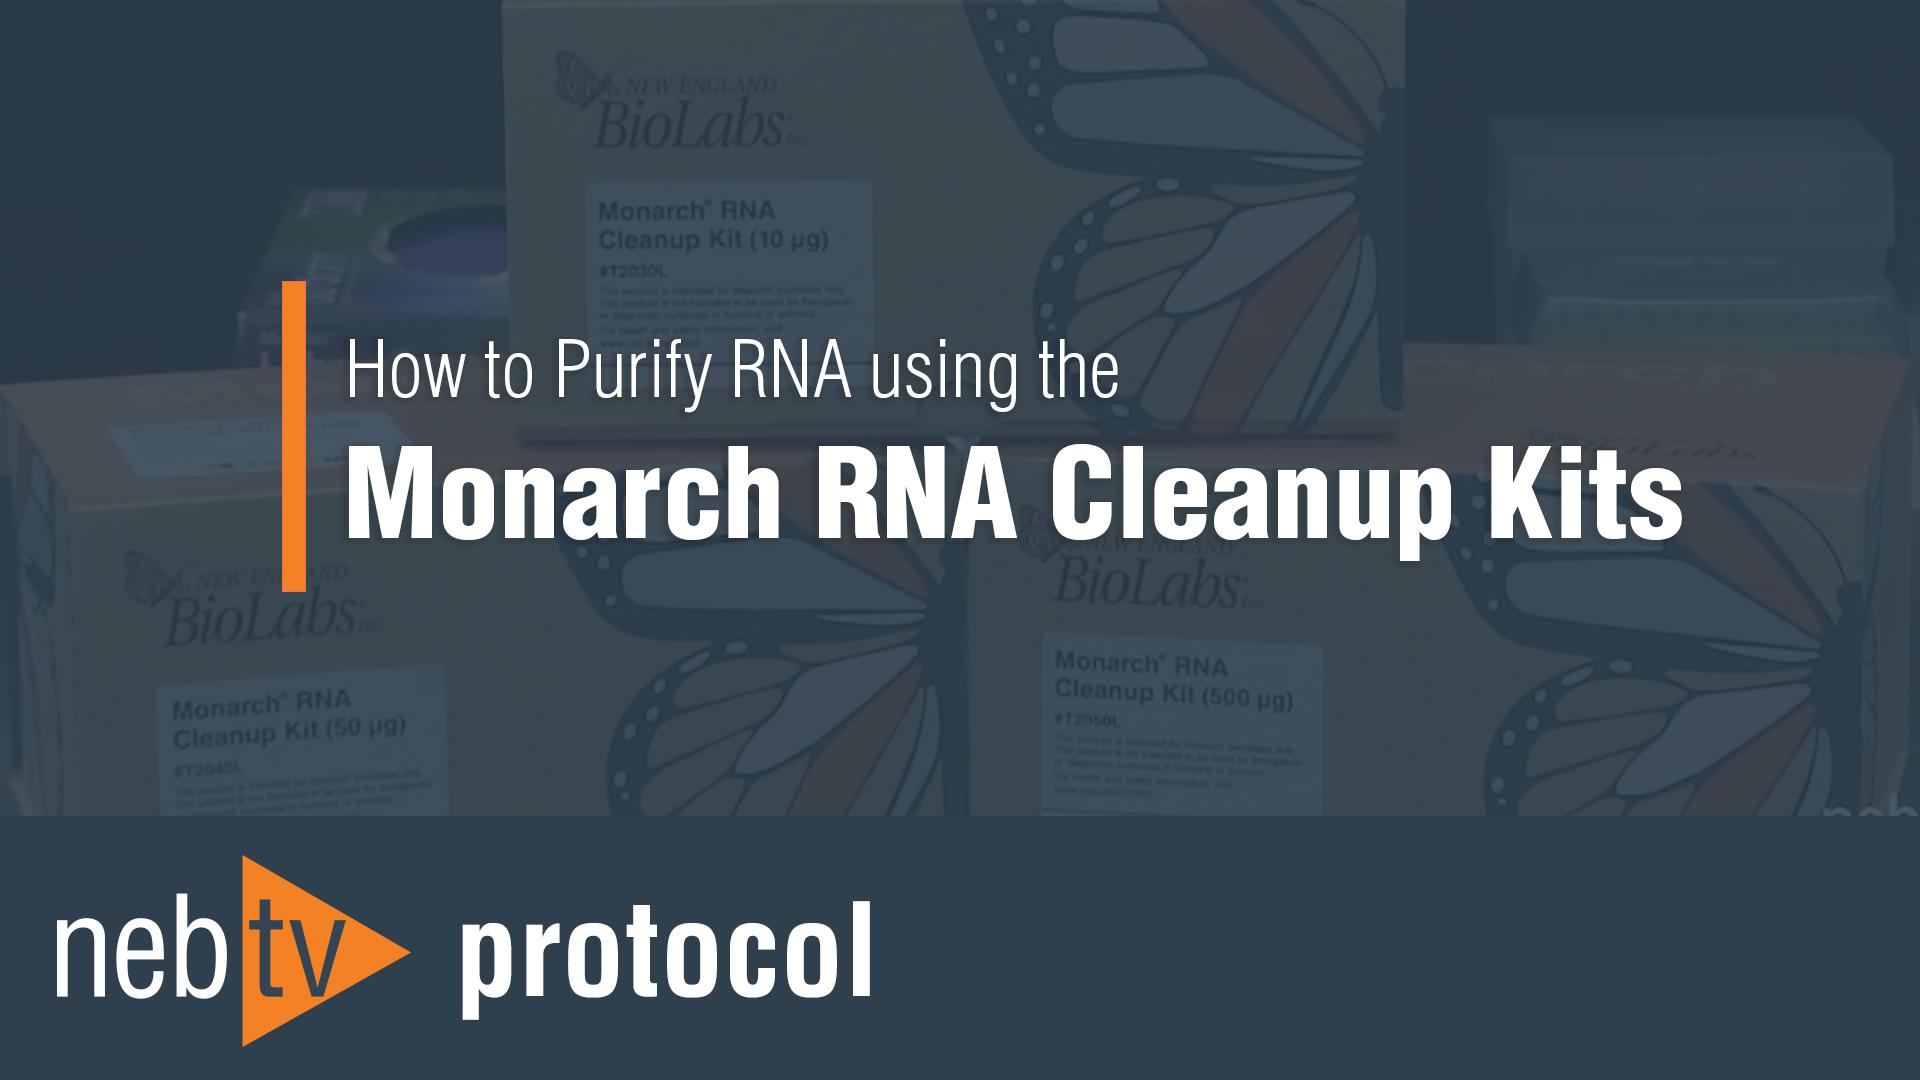 NEBTV_Protocol_HowToPurifyRNAusingTheMonarchRNAcleanupKit_1920